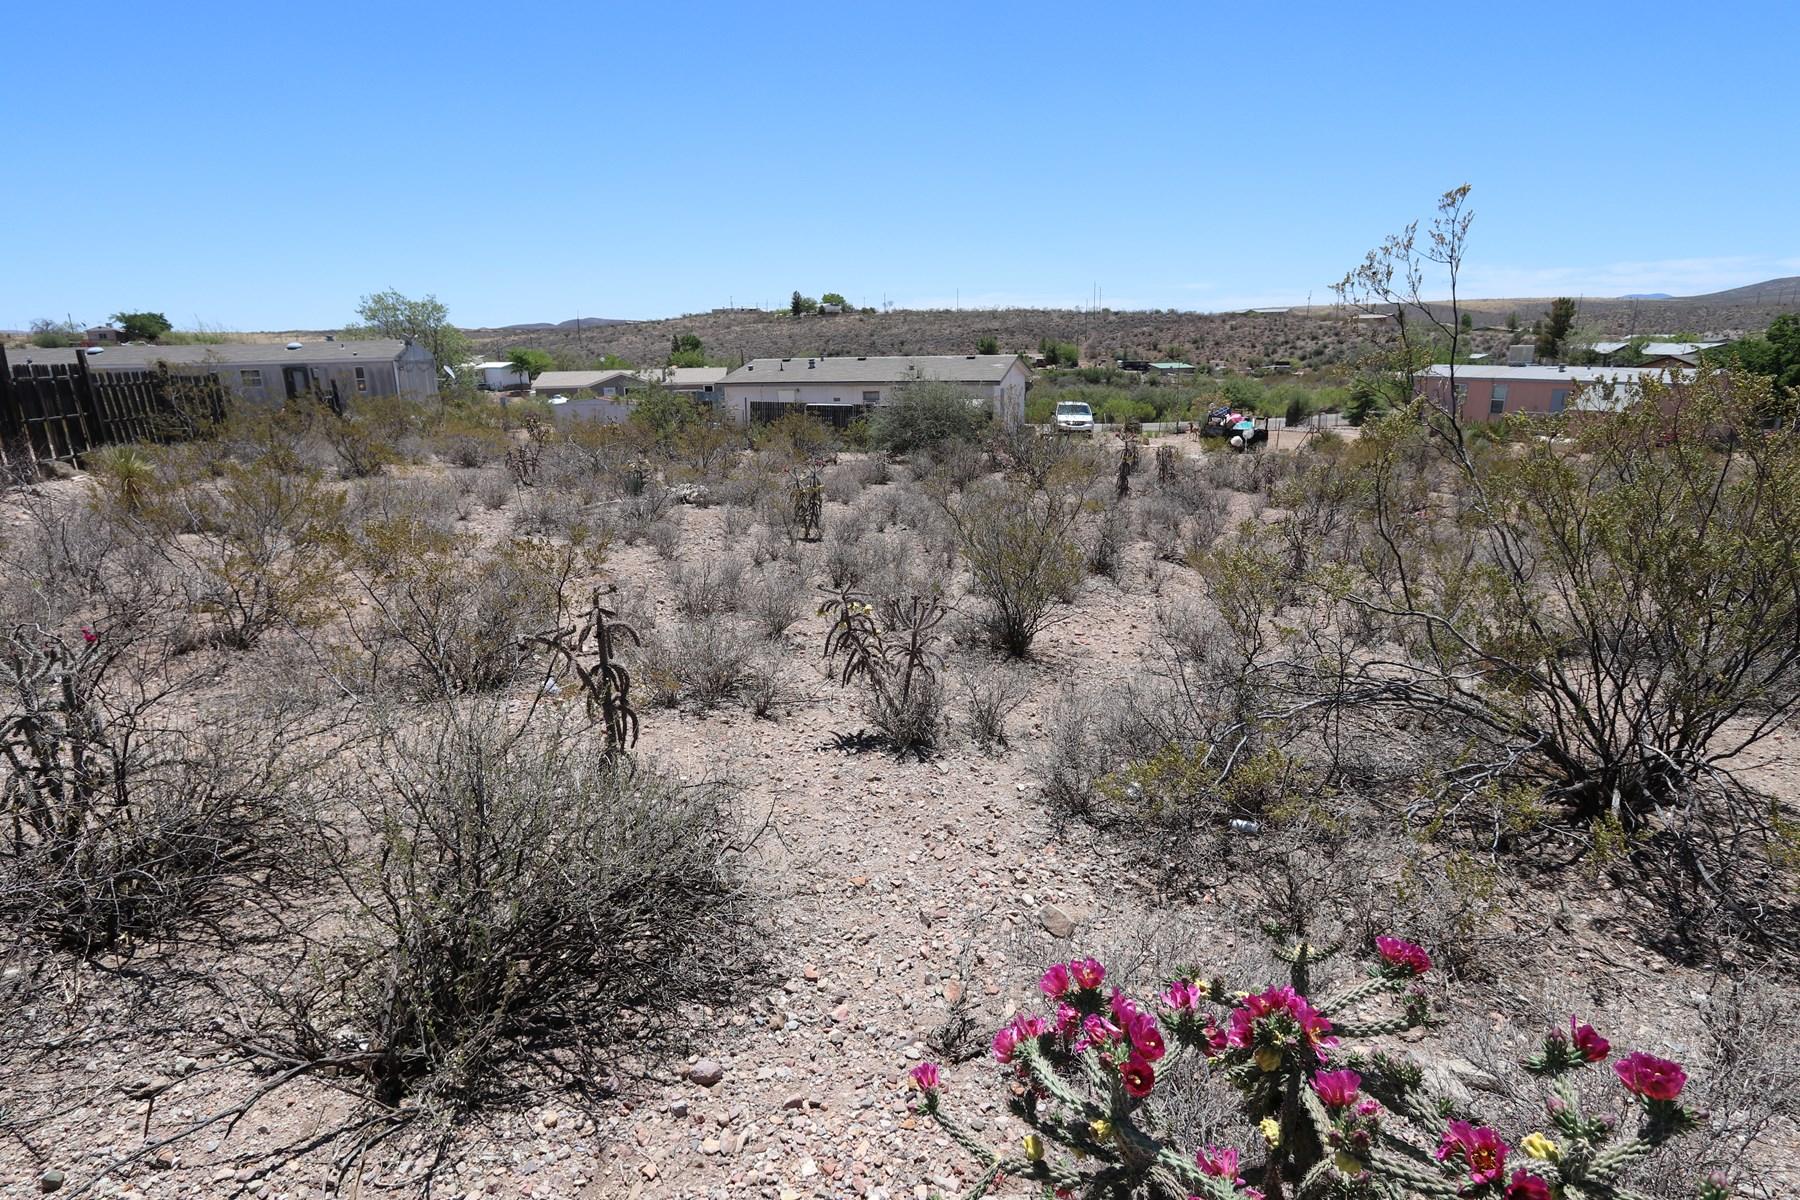 Scenic Lot #332 in historical Tombstone, Arizona.